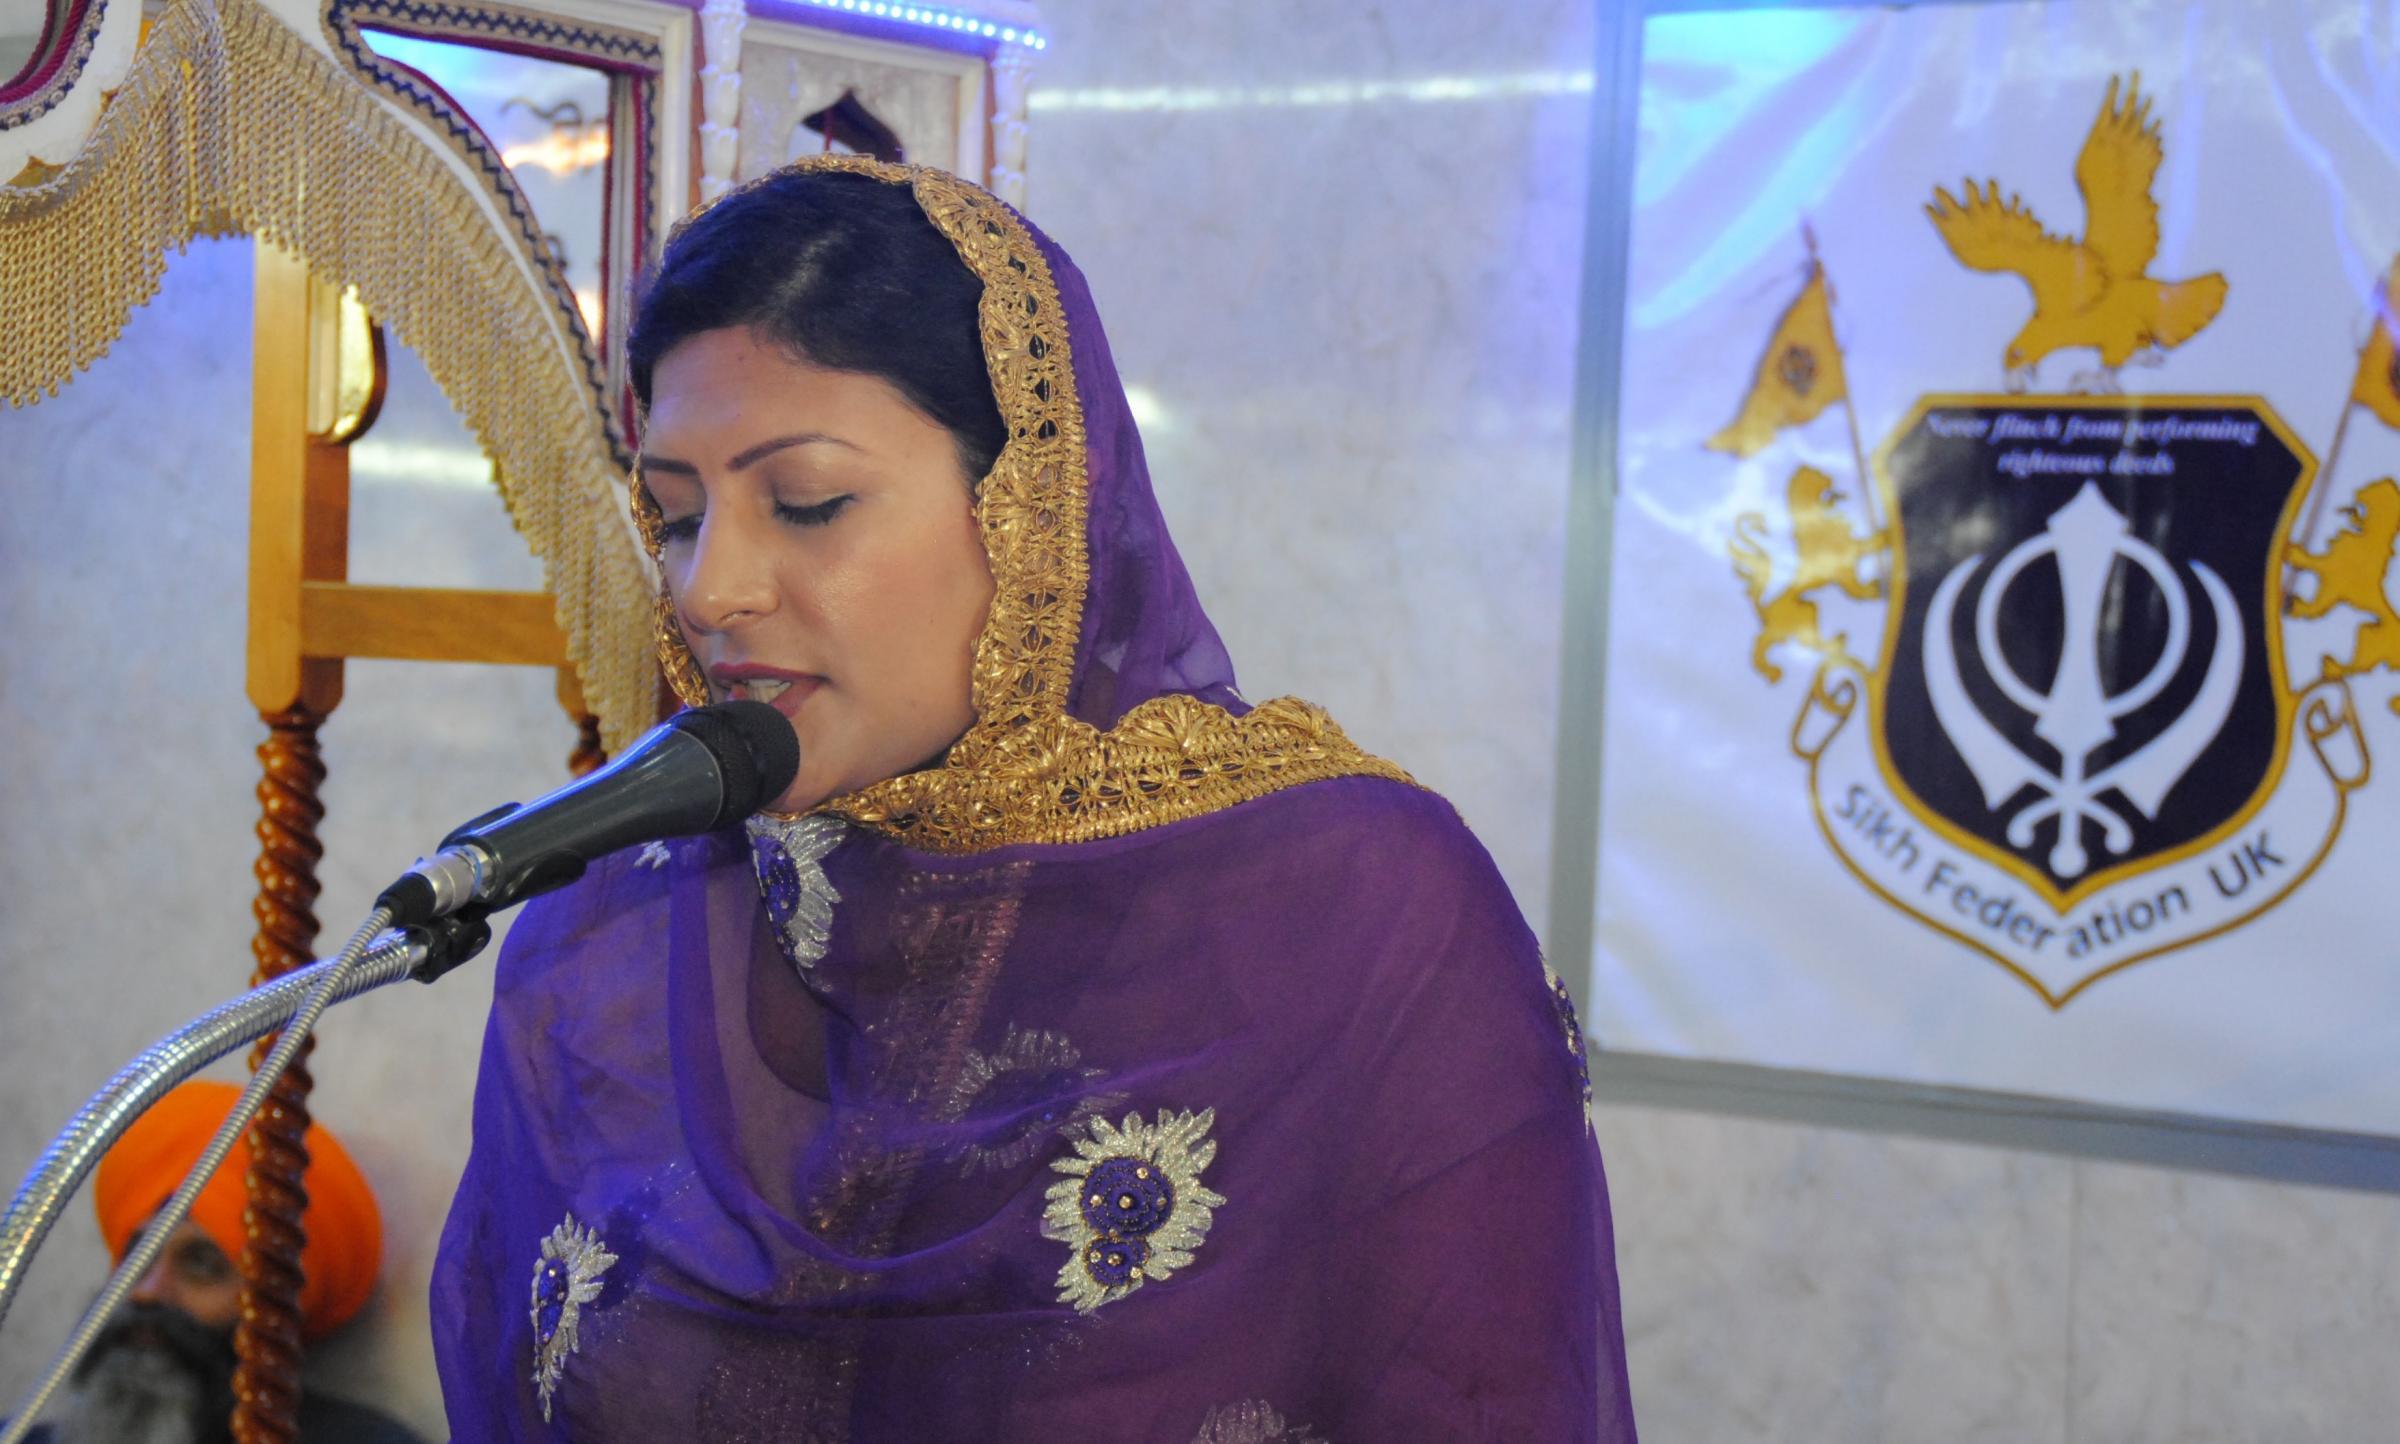 Preet Kaur Gill